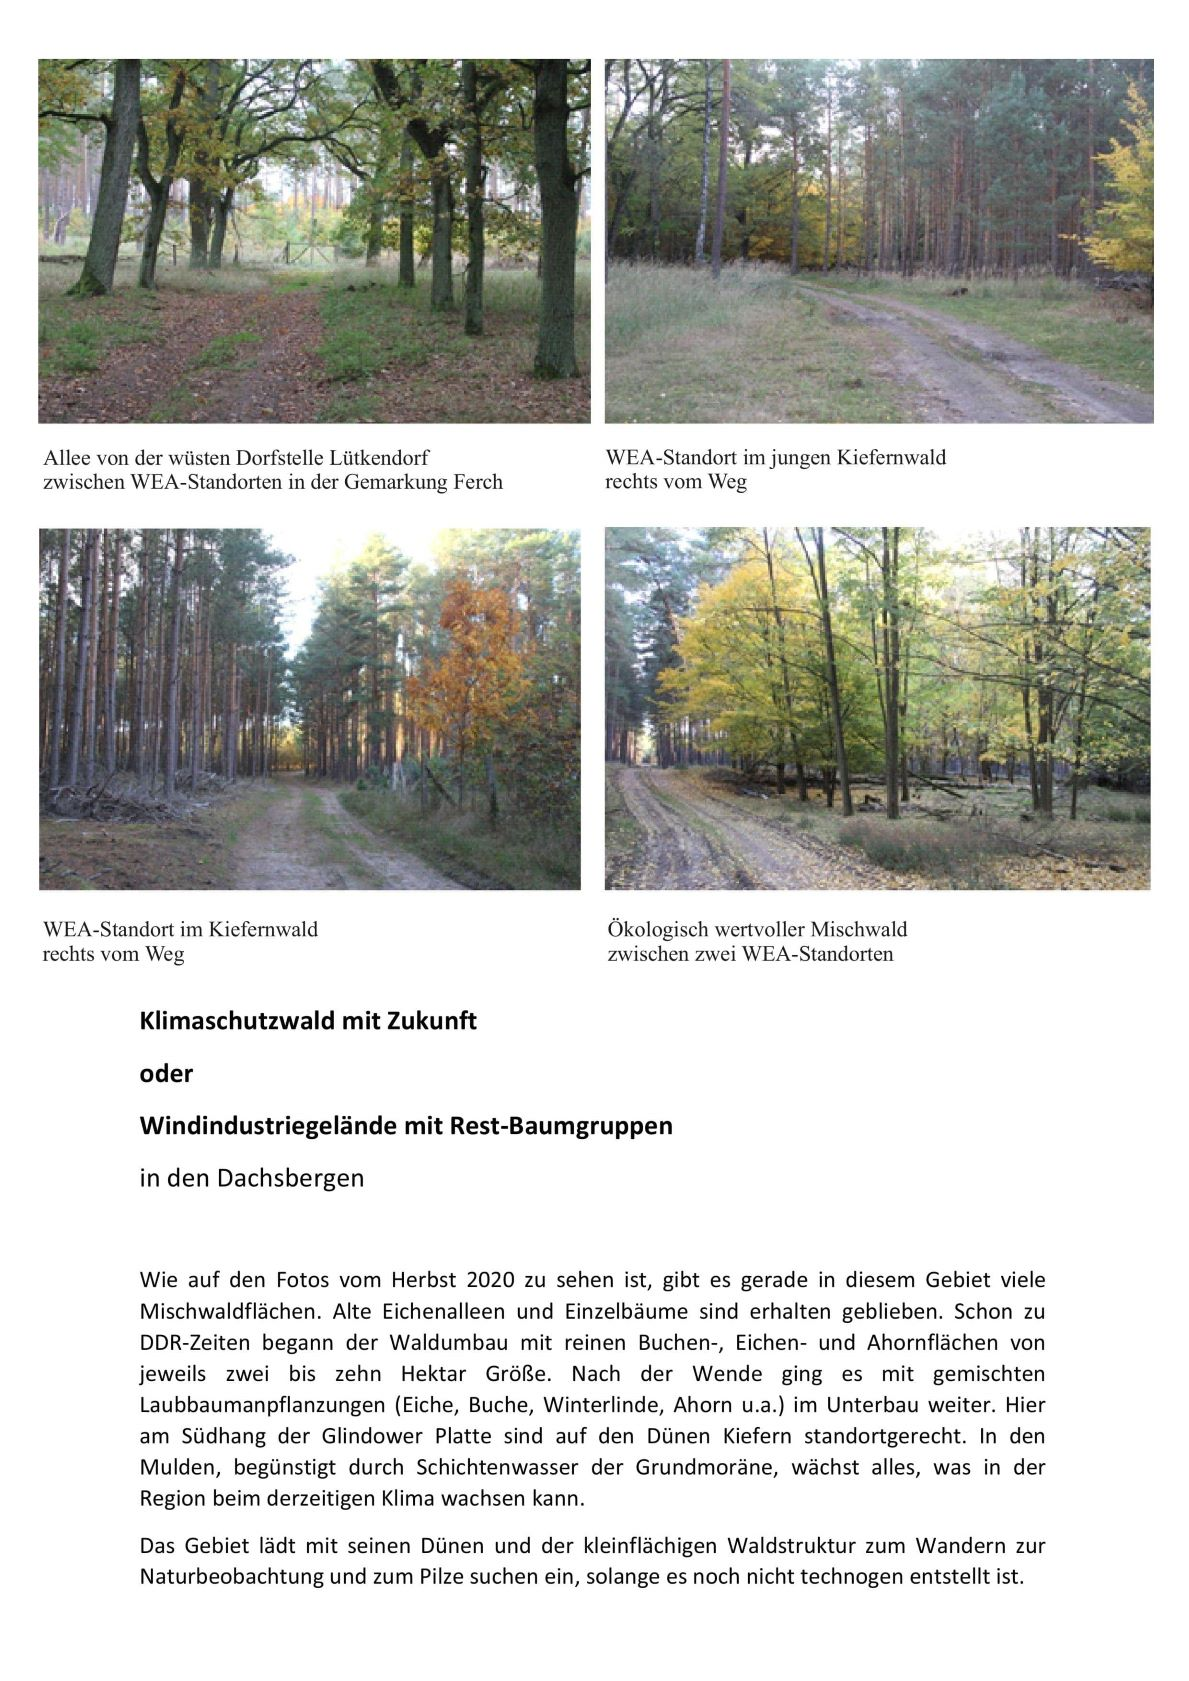 Dachsberg 1-min2